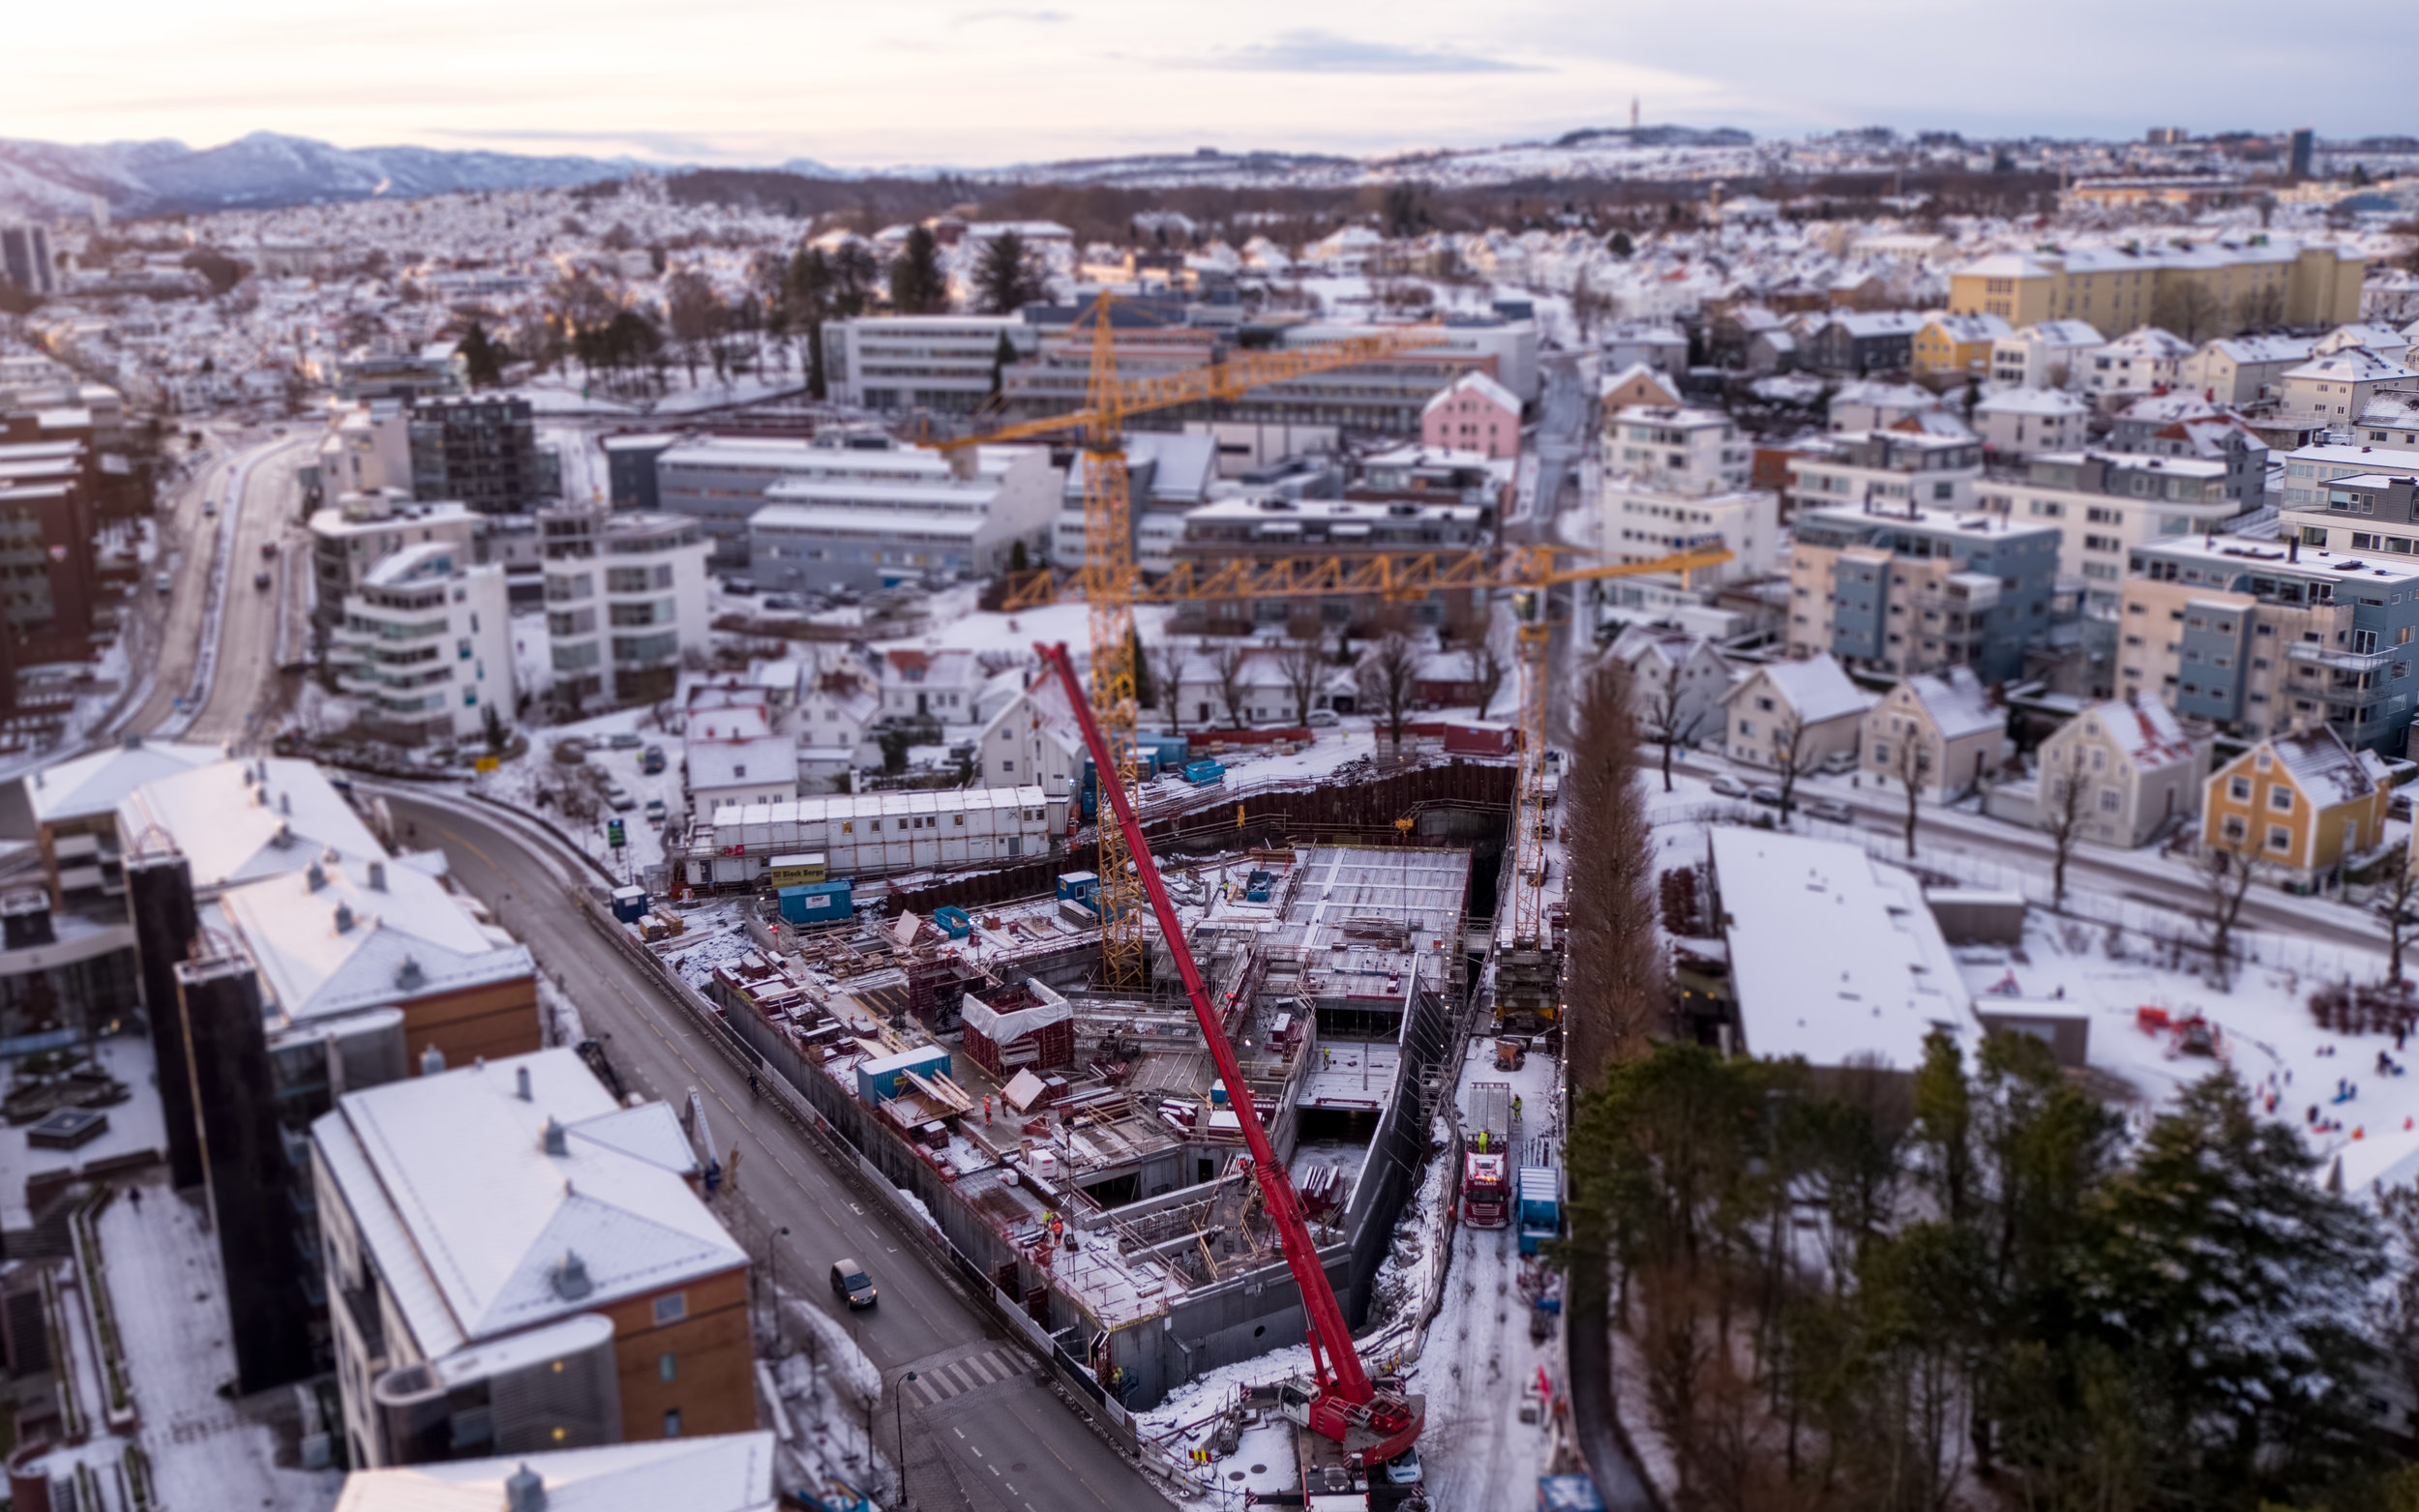 FINANSPARKEN I VINTERDRAKT: Slik så det ut i Bjergsted da snøen lå i Stavanger i januar.Foto: Aeroview